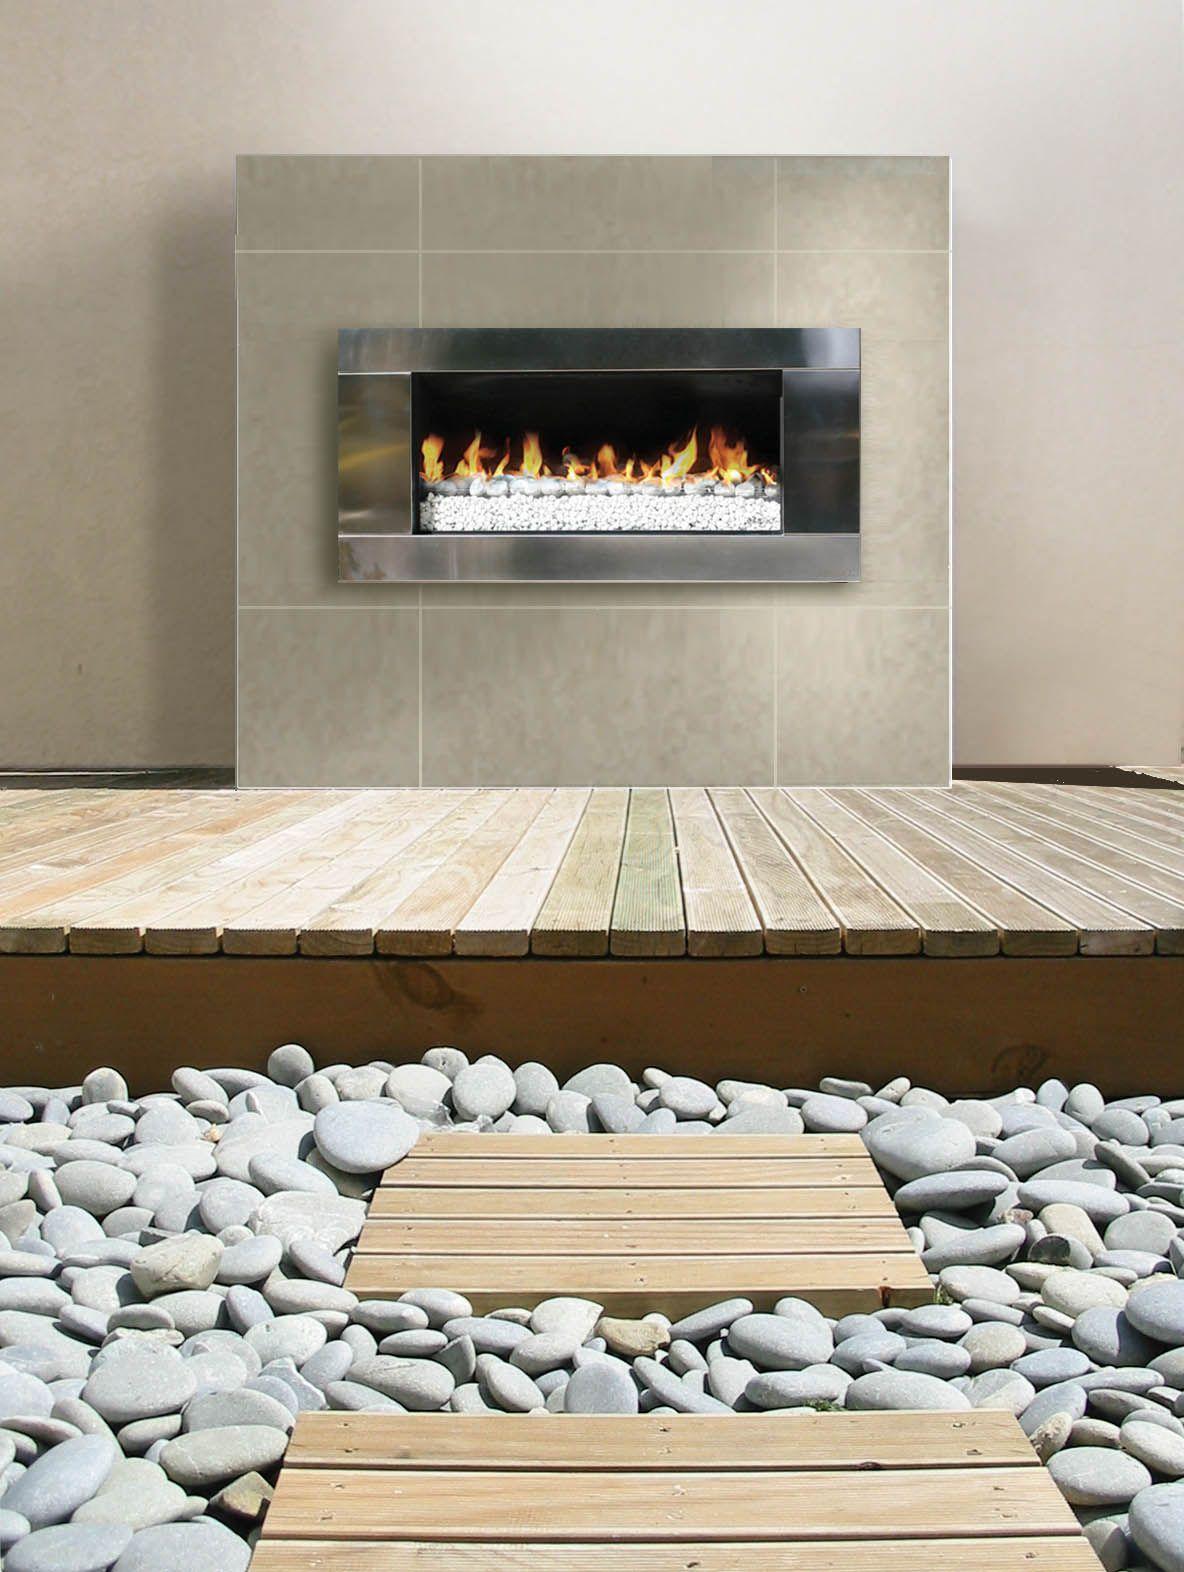 escea ef5000 outdoor gas fireplace with white coals outdoor rh pinterest com